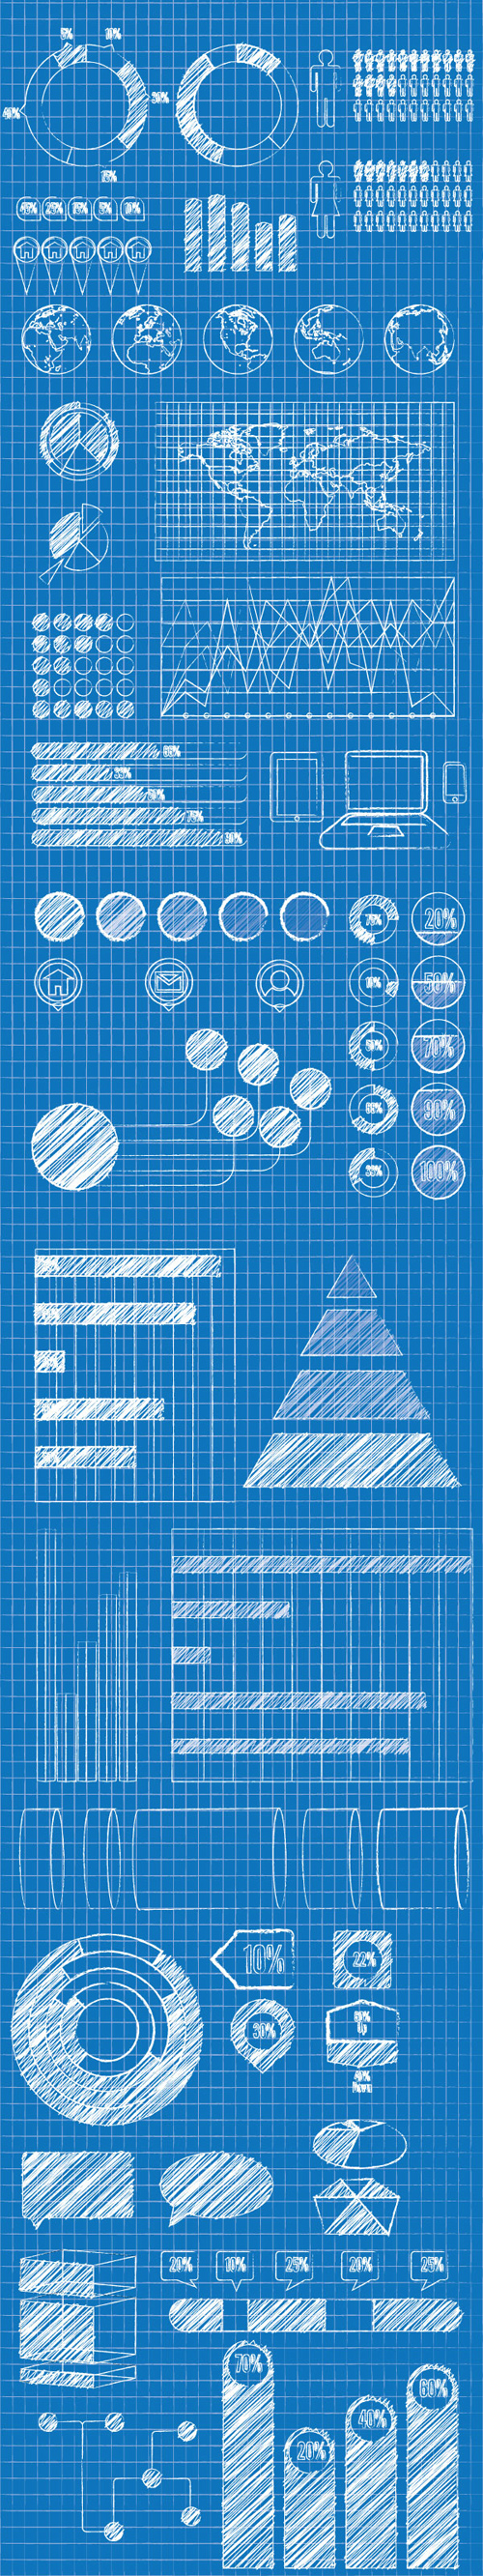 Blueprint Infographic Elements